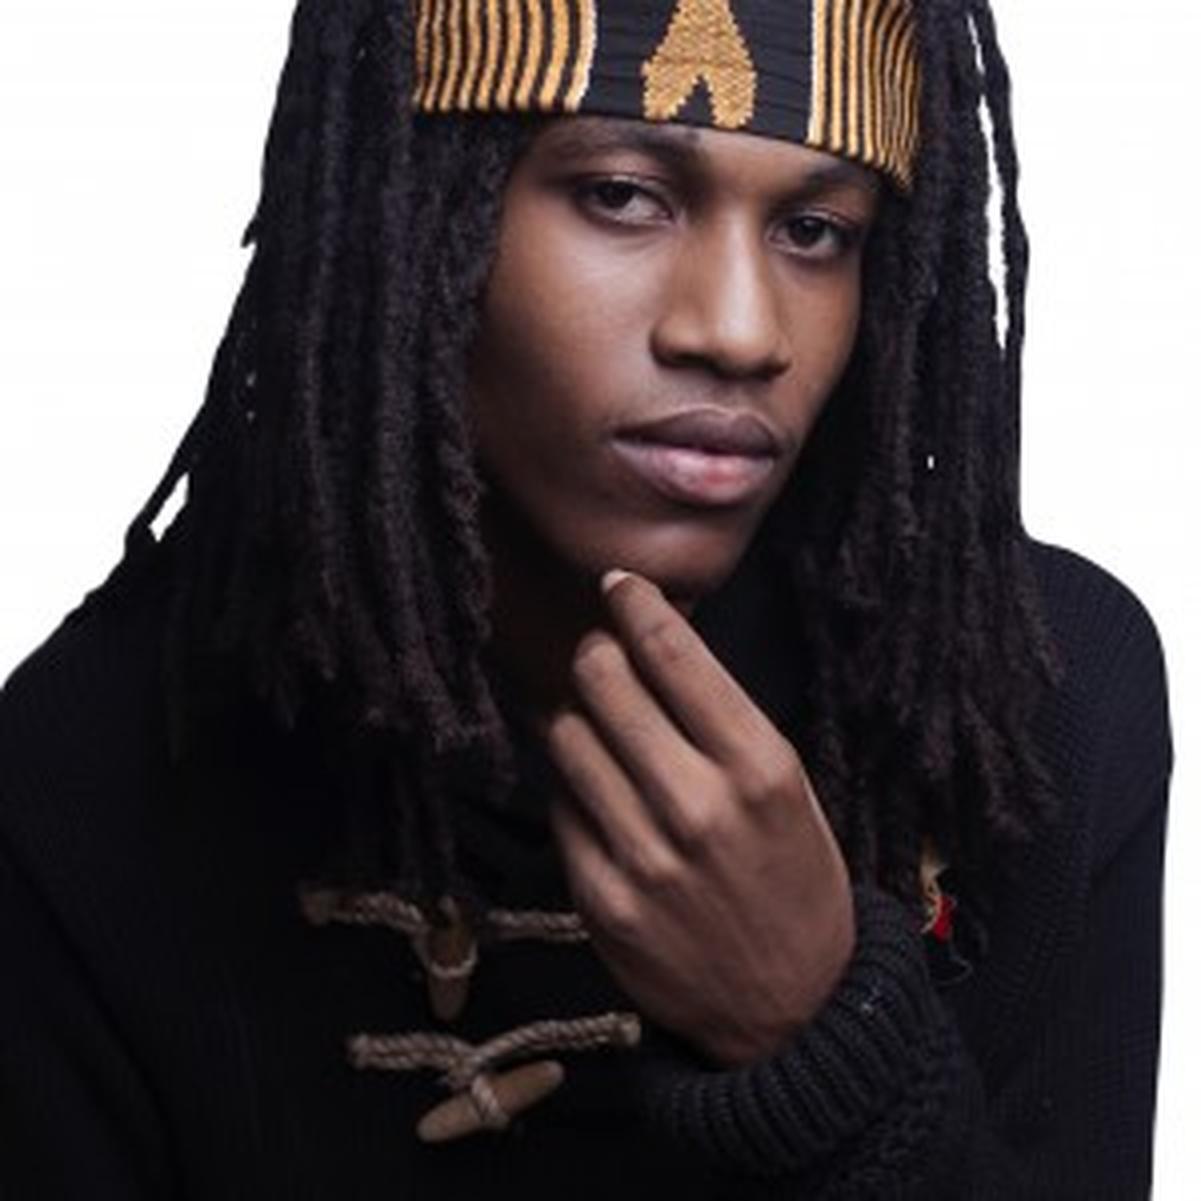 Yung J.R